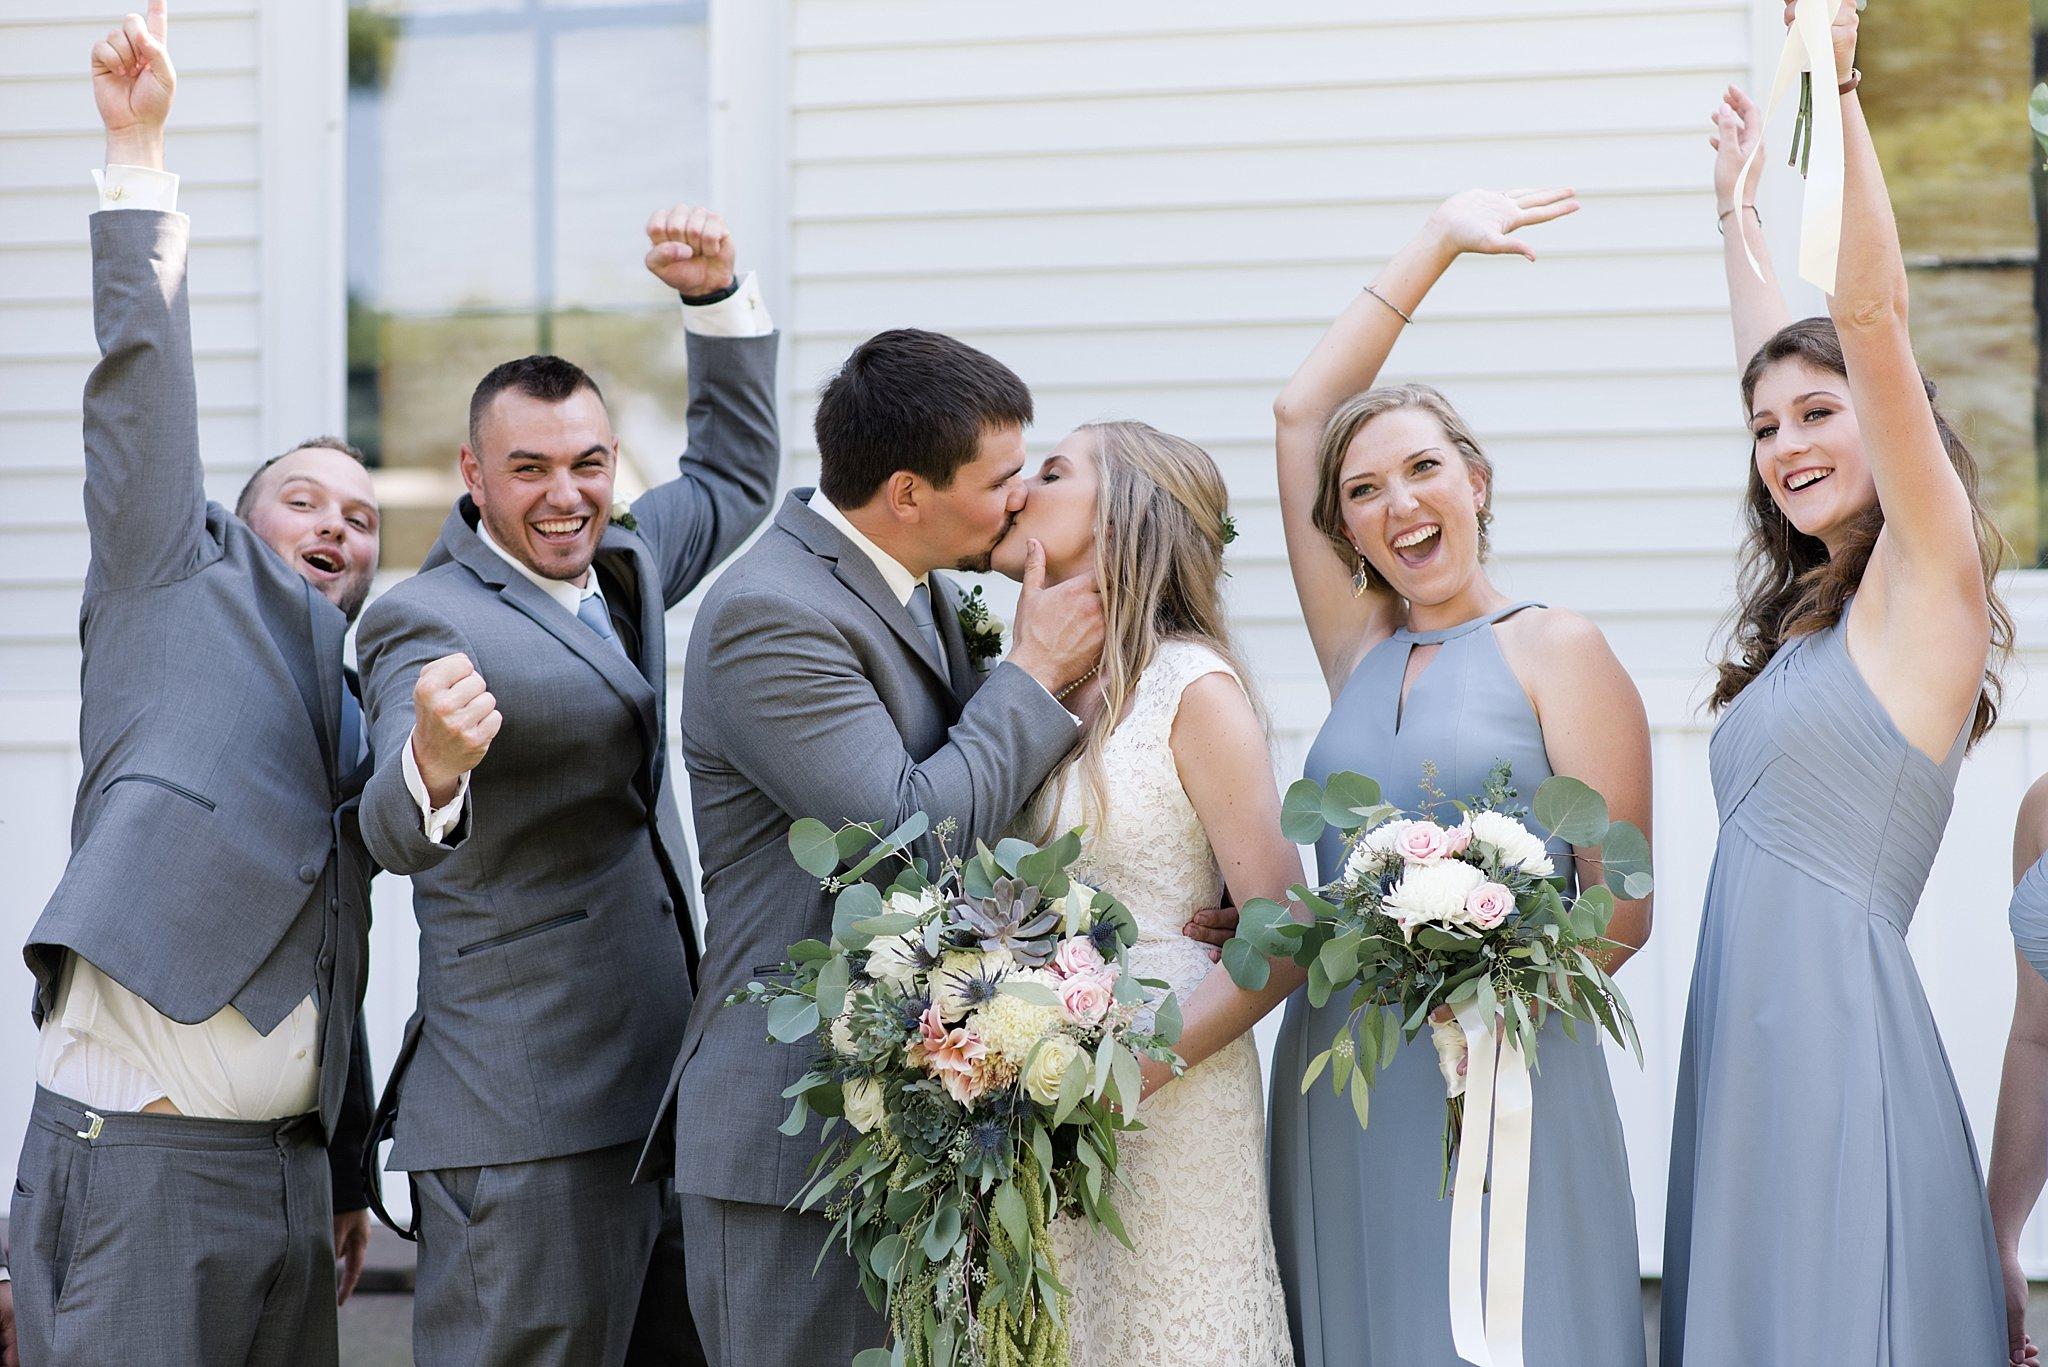 Cadillac-Michigan-wedding-caberfae-peaks-milwaukee-photographer_0041.jpg